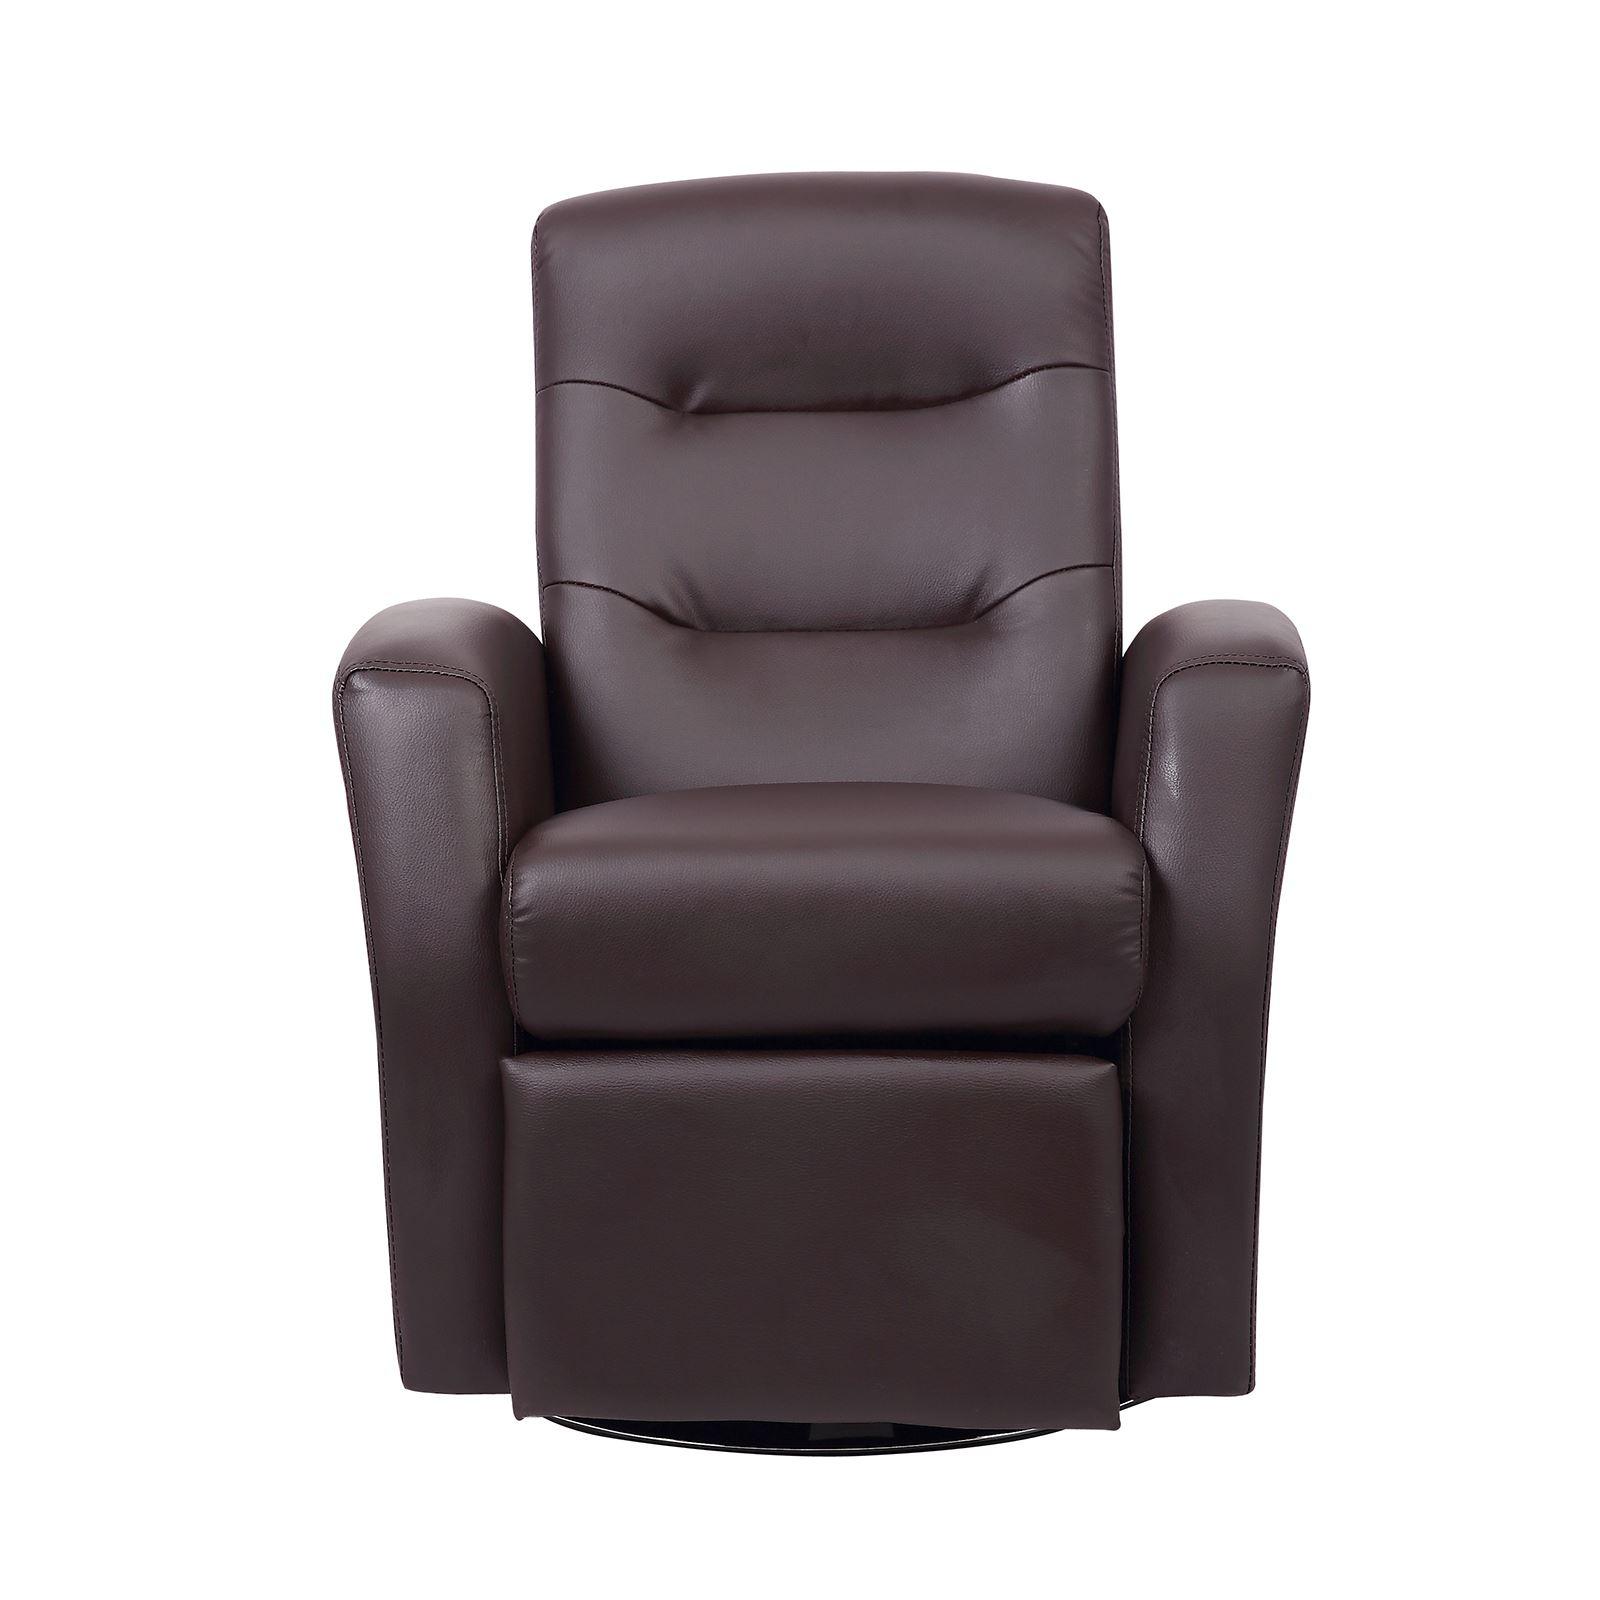 Bon Luxury Kids Reclining Swivel Chair Childrens Comfortable Faux